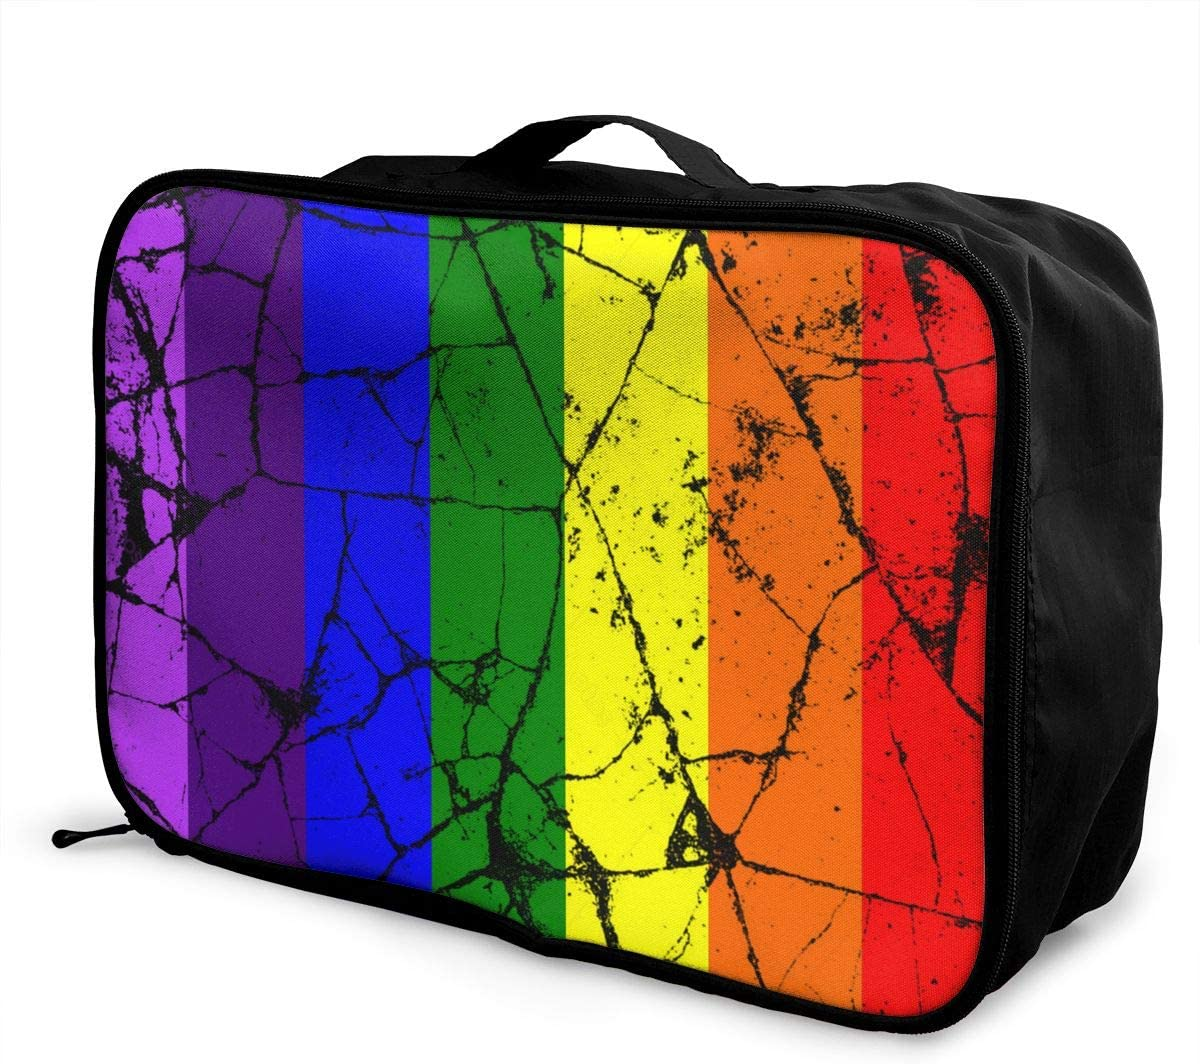 YueLJB Rainbow LGBT Flag Lightweight Large Capacity Portable Luggage Bag Travel Duffel Bag Storage Carry Luggage Duffle Tote Bag